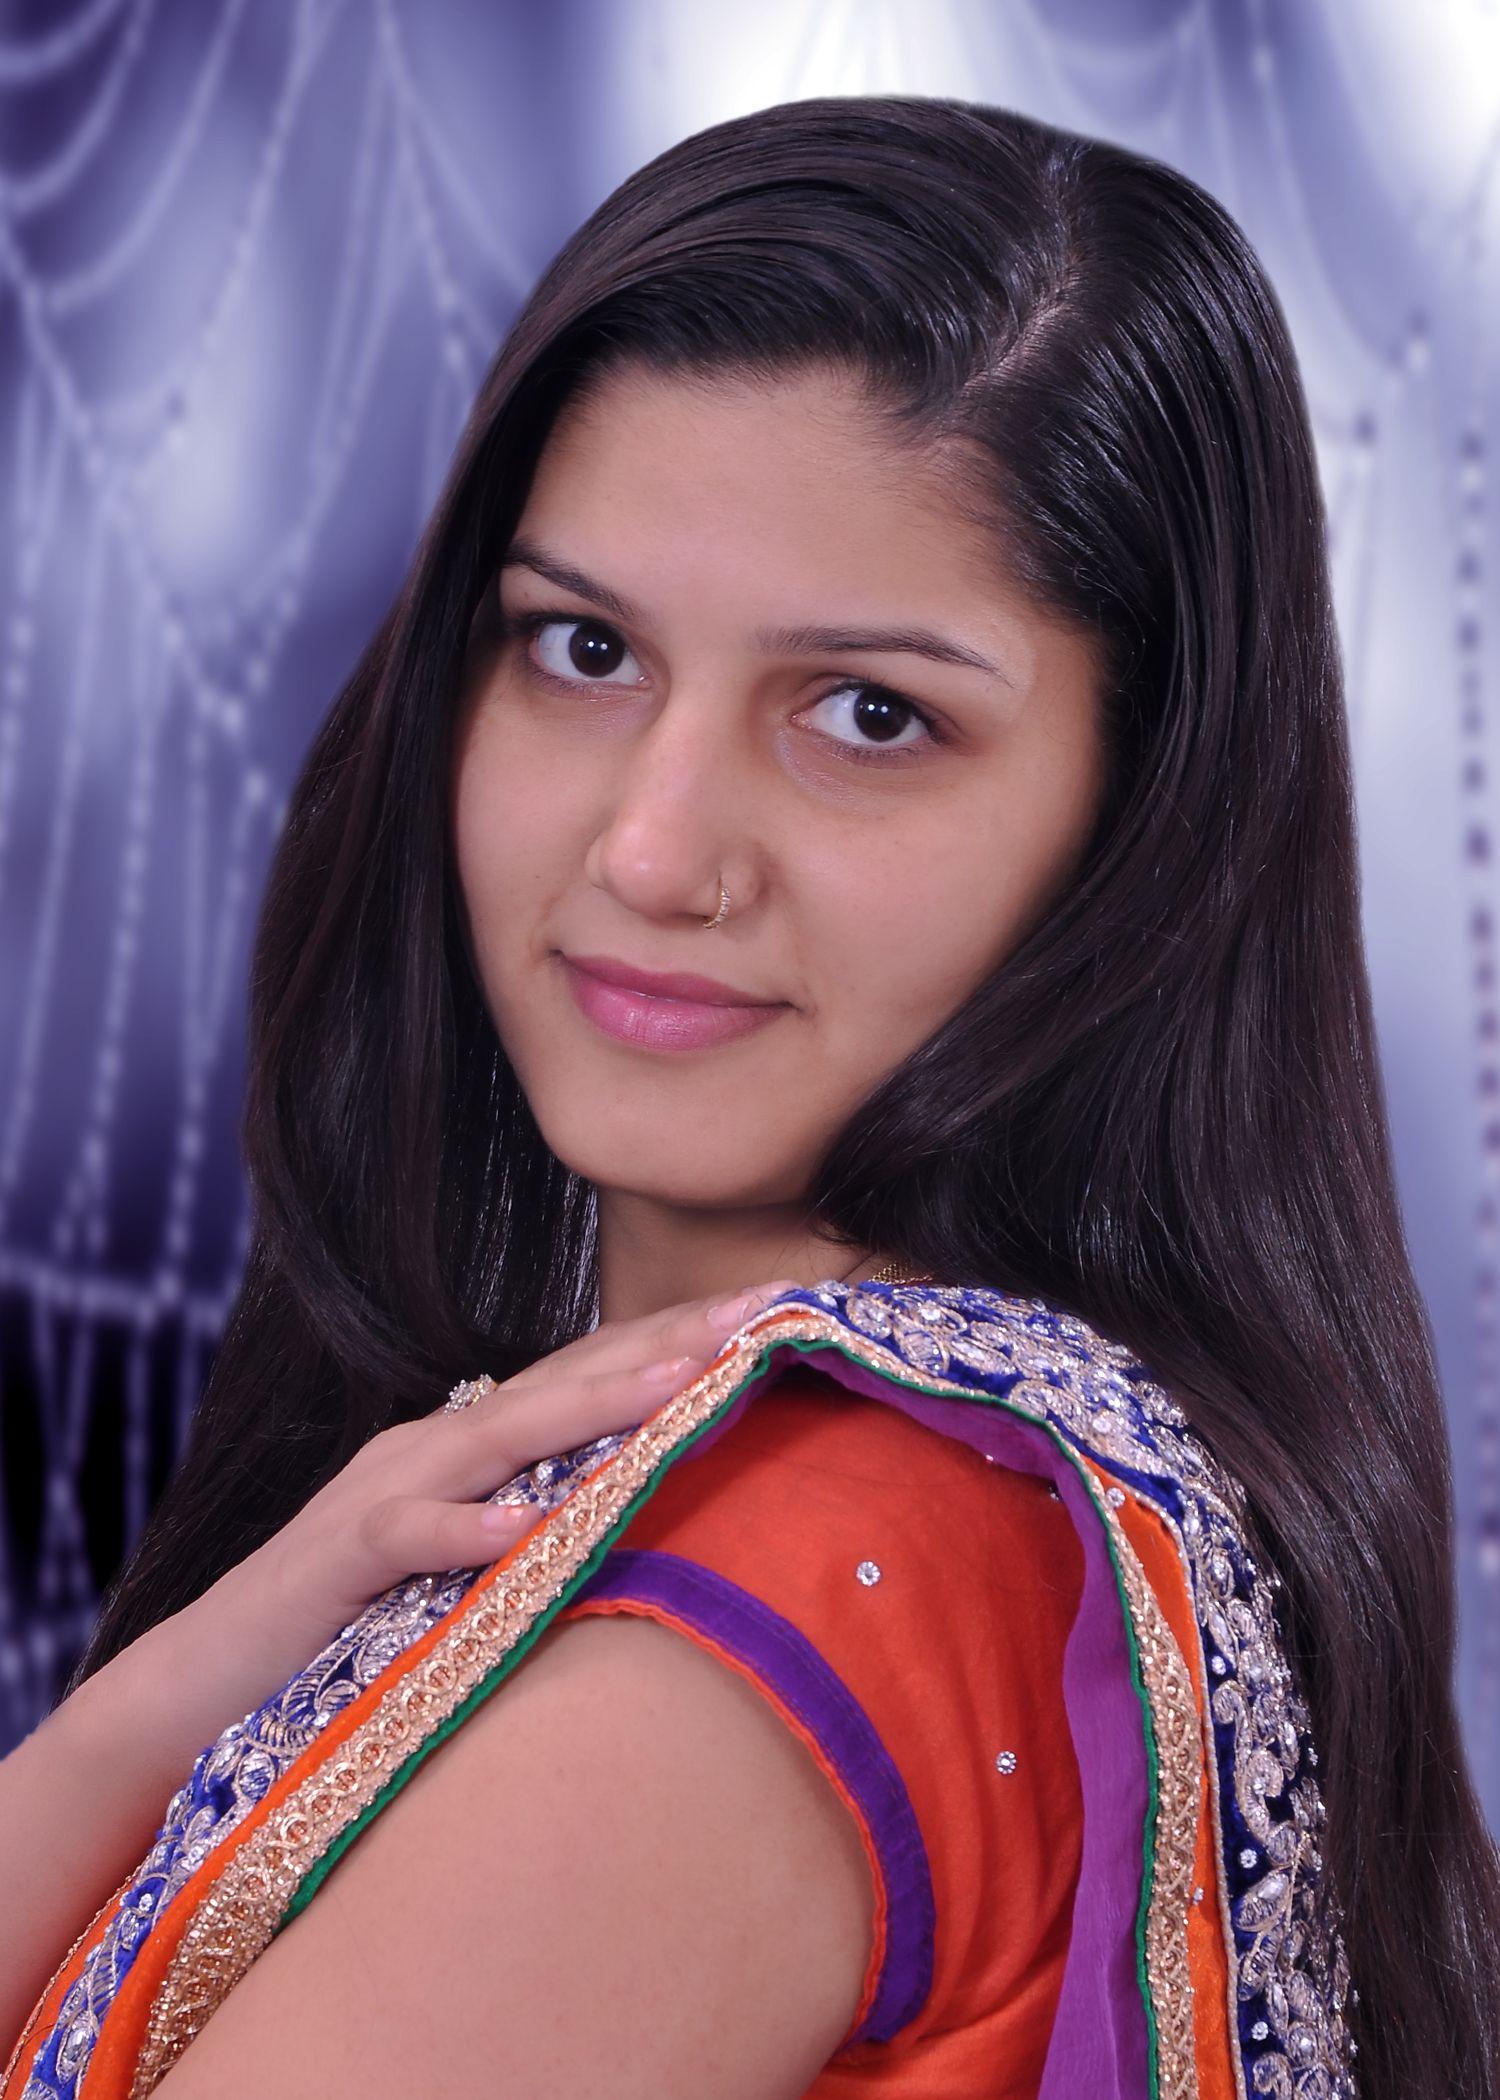 Sapna Dance New Haryanvi Latest Sapna Choudhary Video Dance Songs